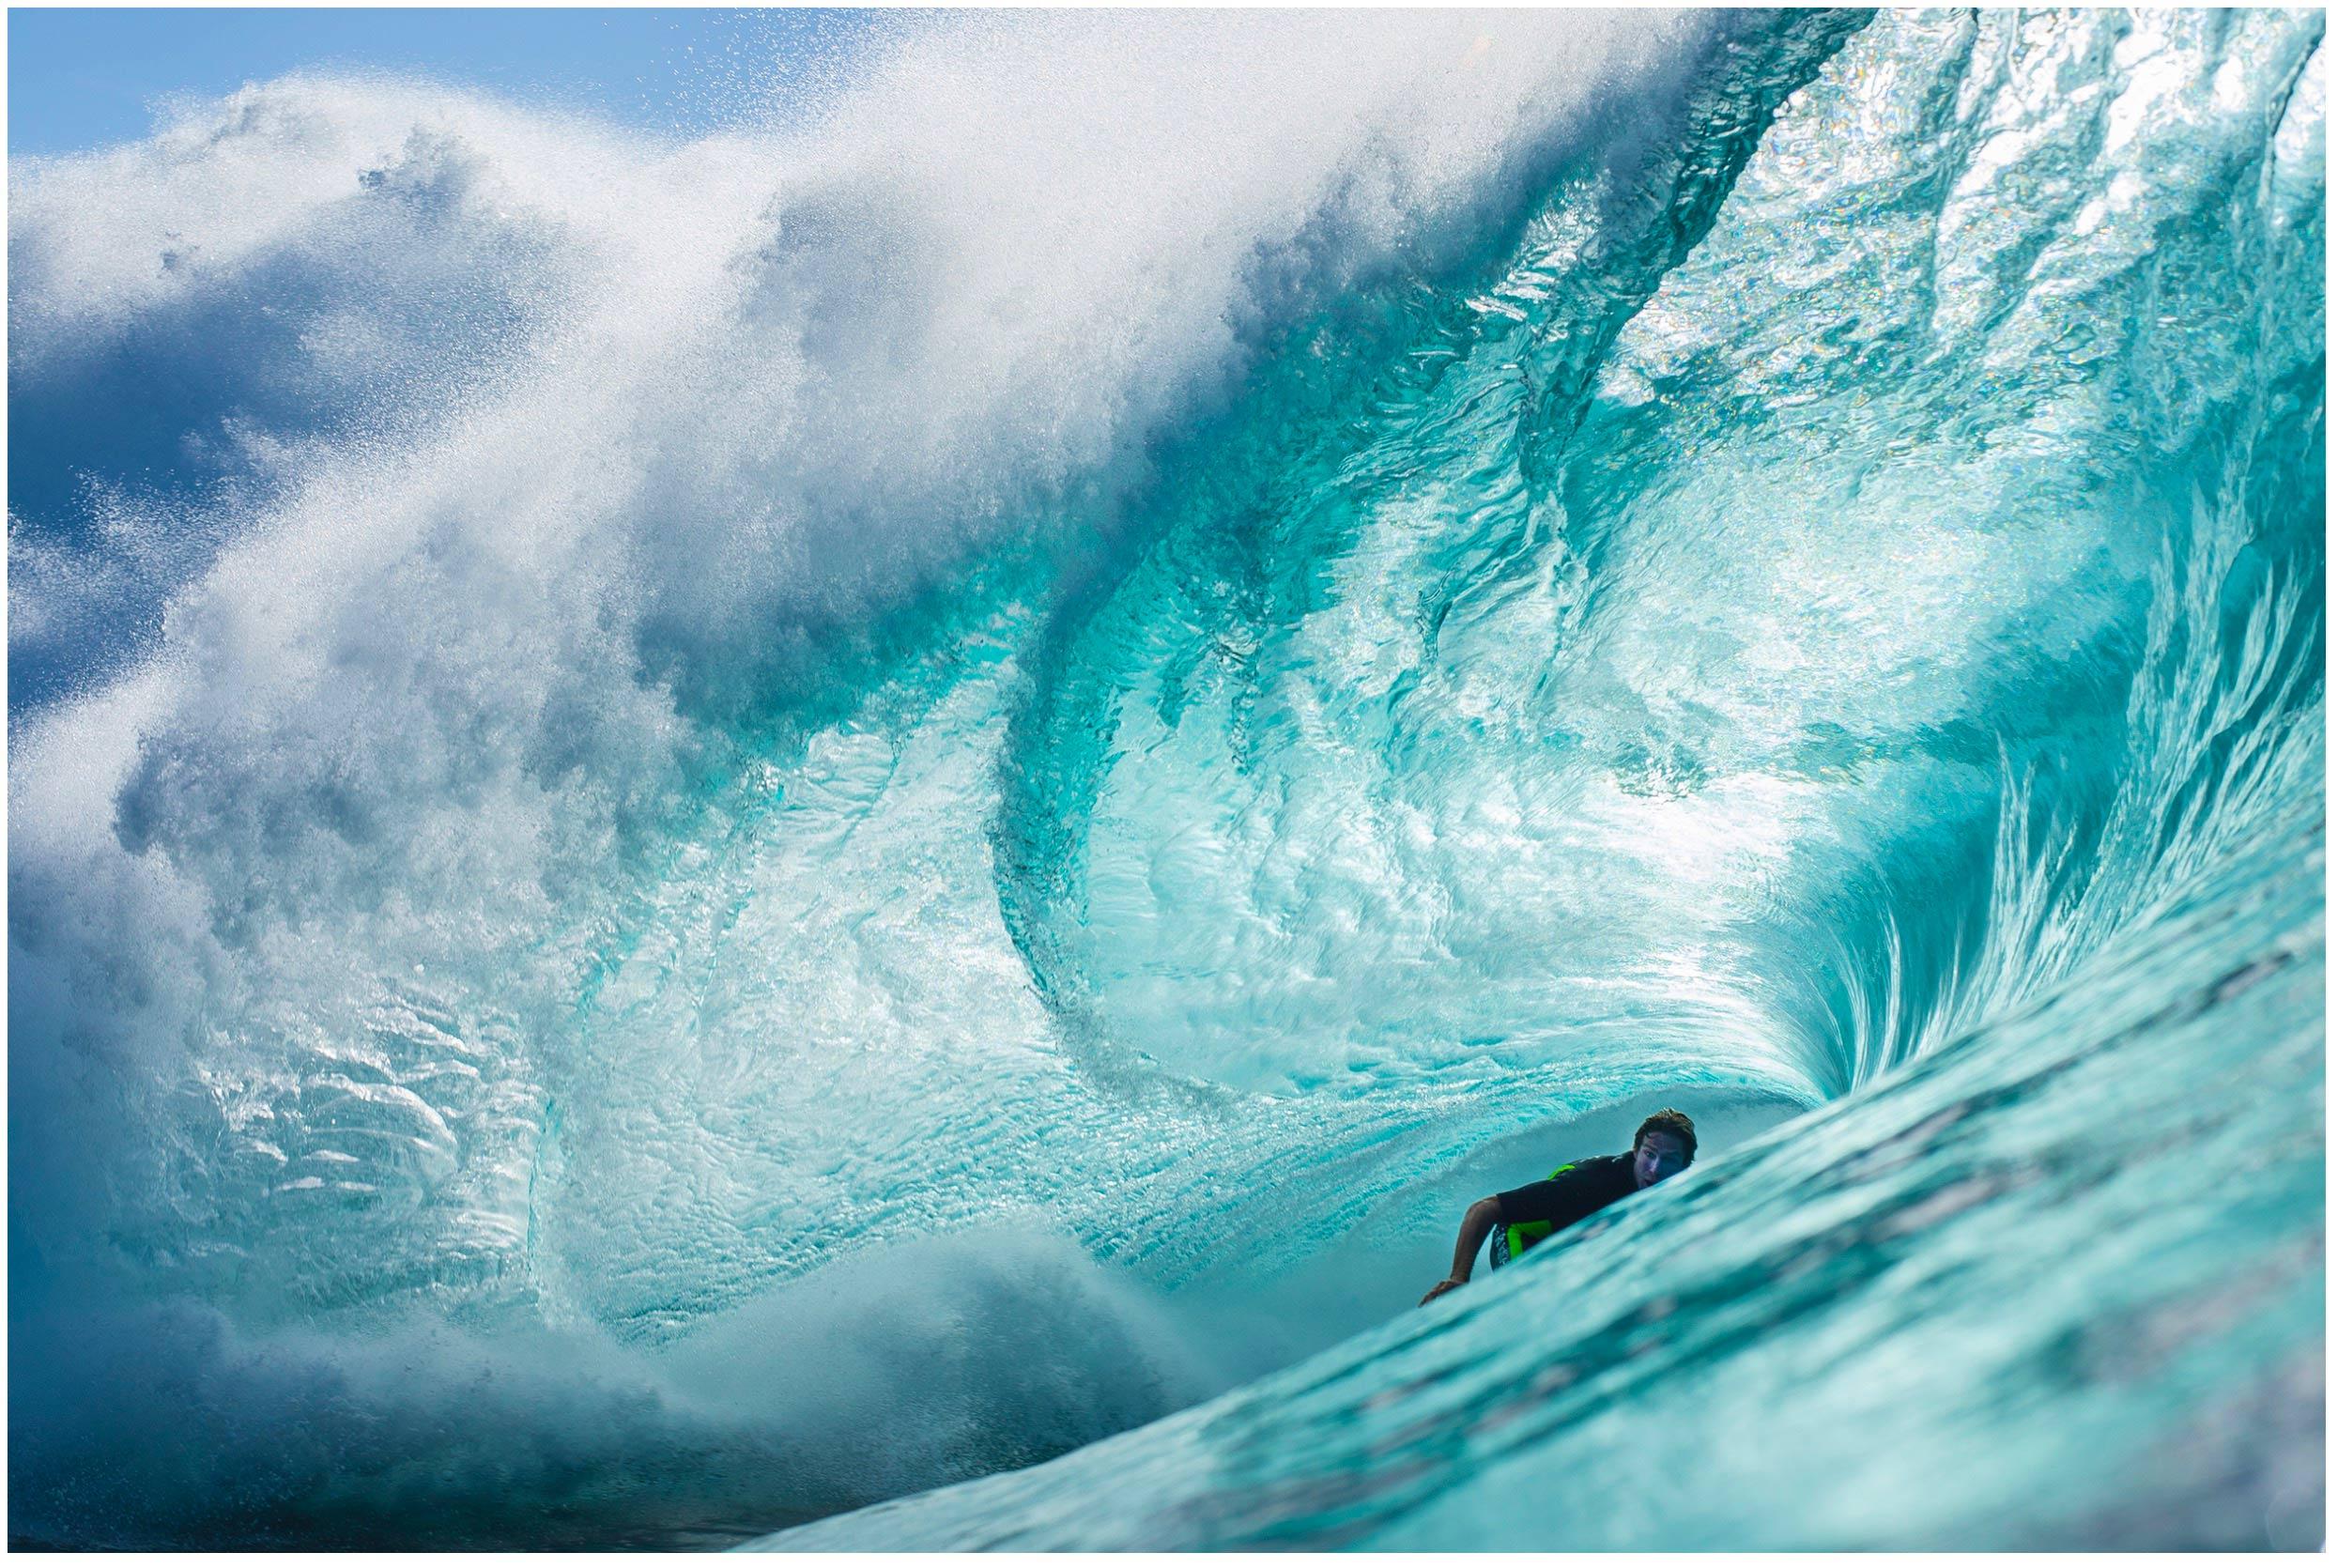 rodd-owen-surf-photography-for-sale-owenphoto-264.jpg